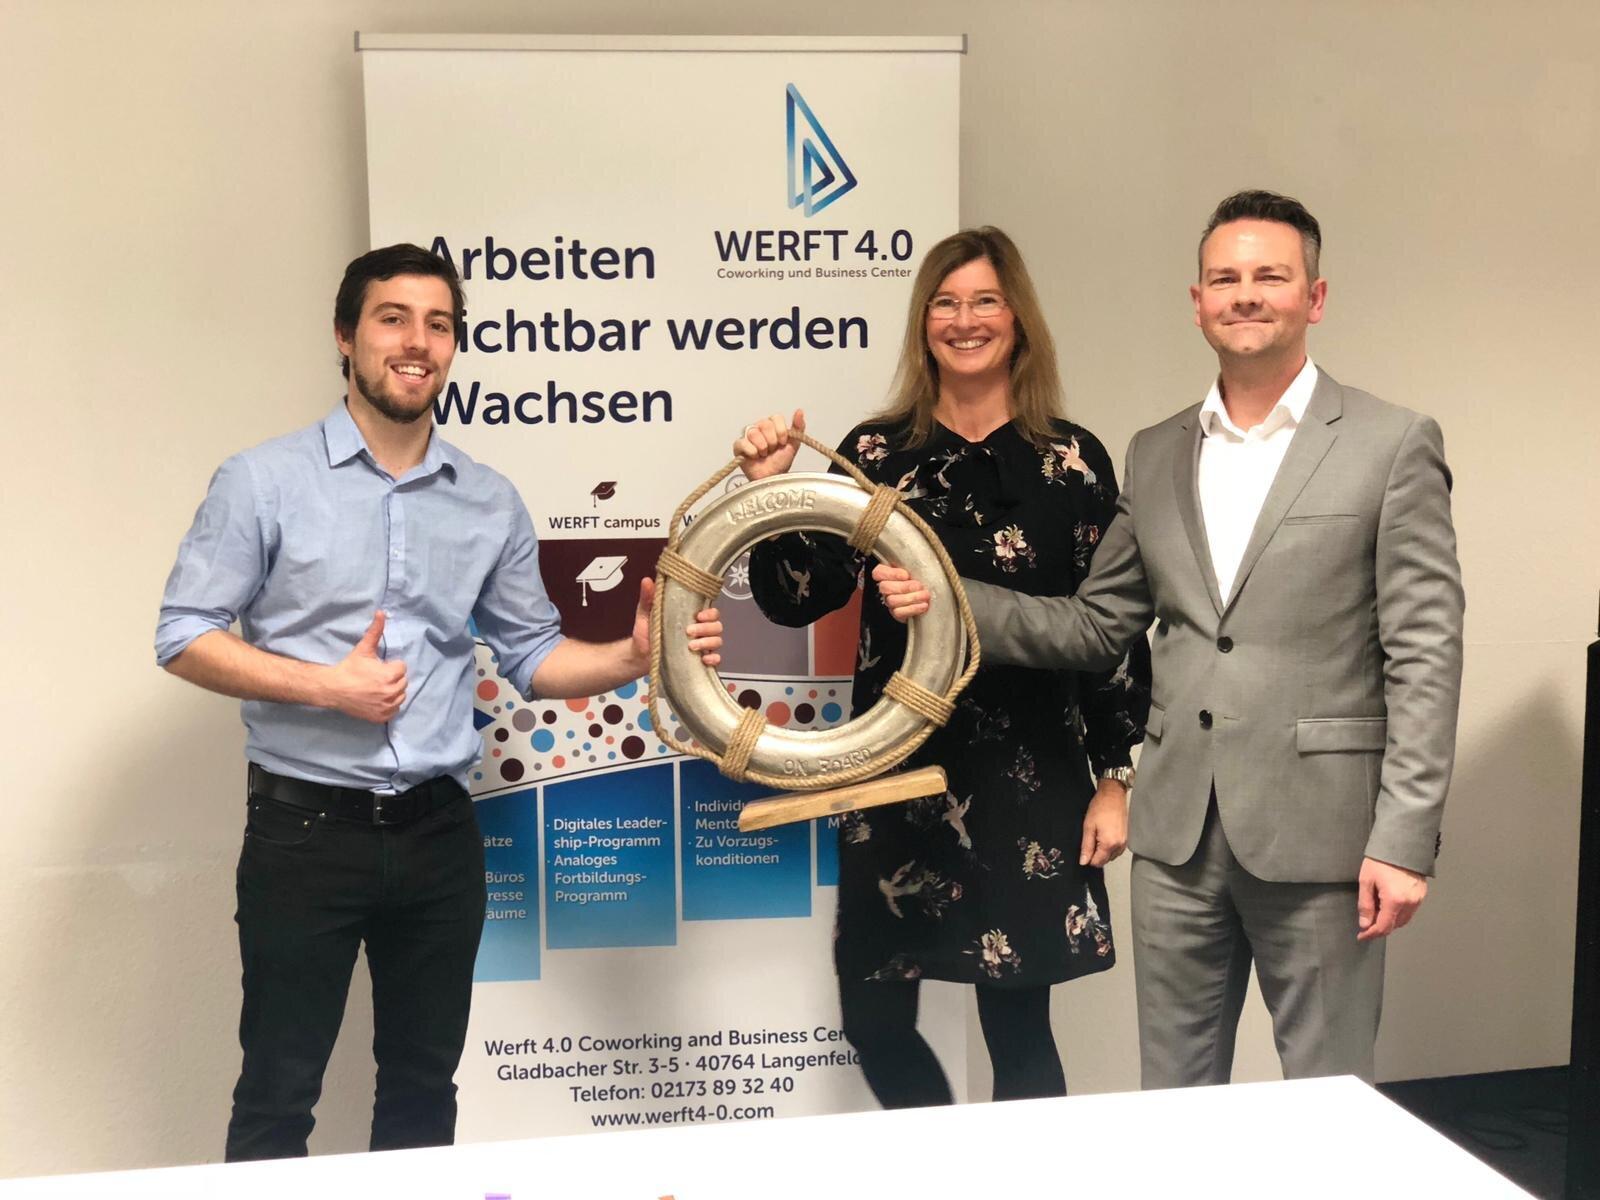 Herr Colin Berr, Frau Katja von Eysmondt, Herr Wolfgang Kierdorf